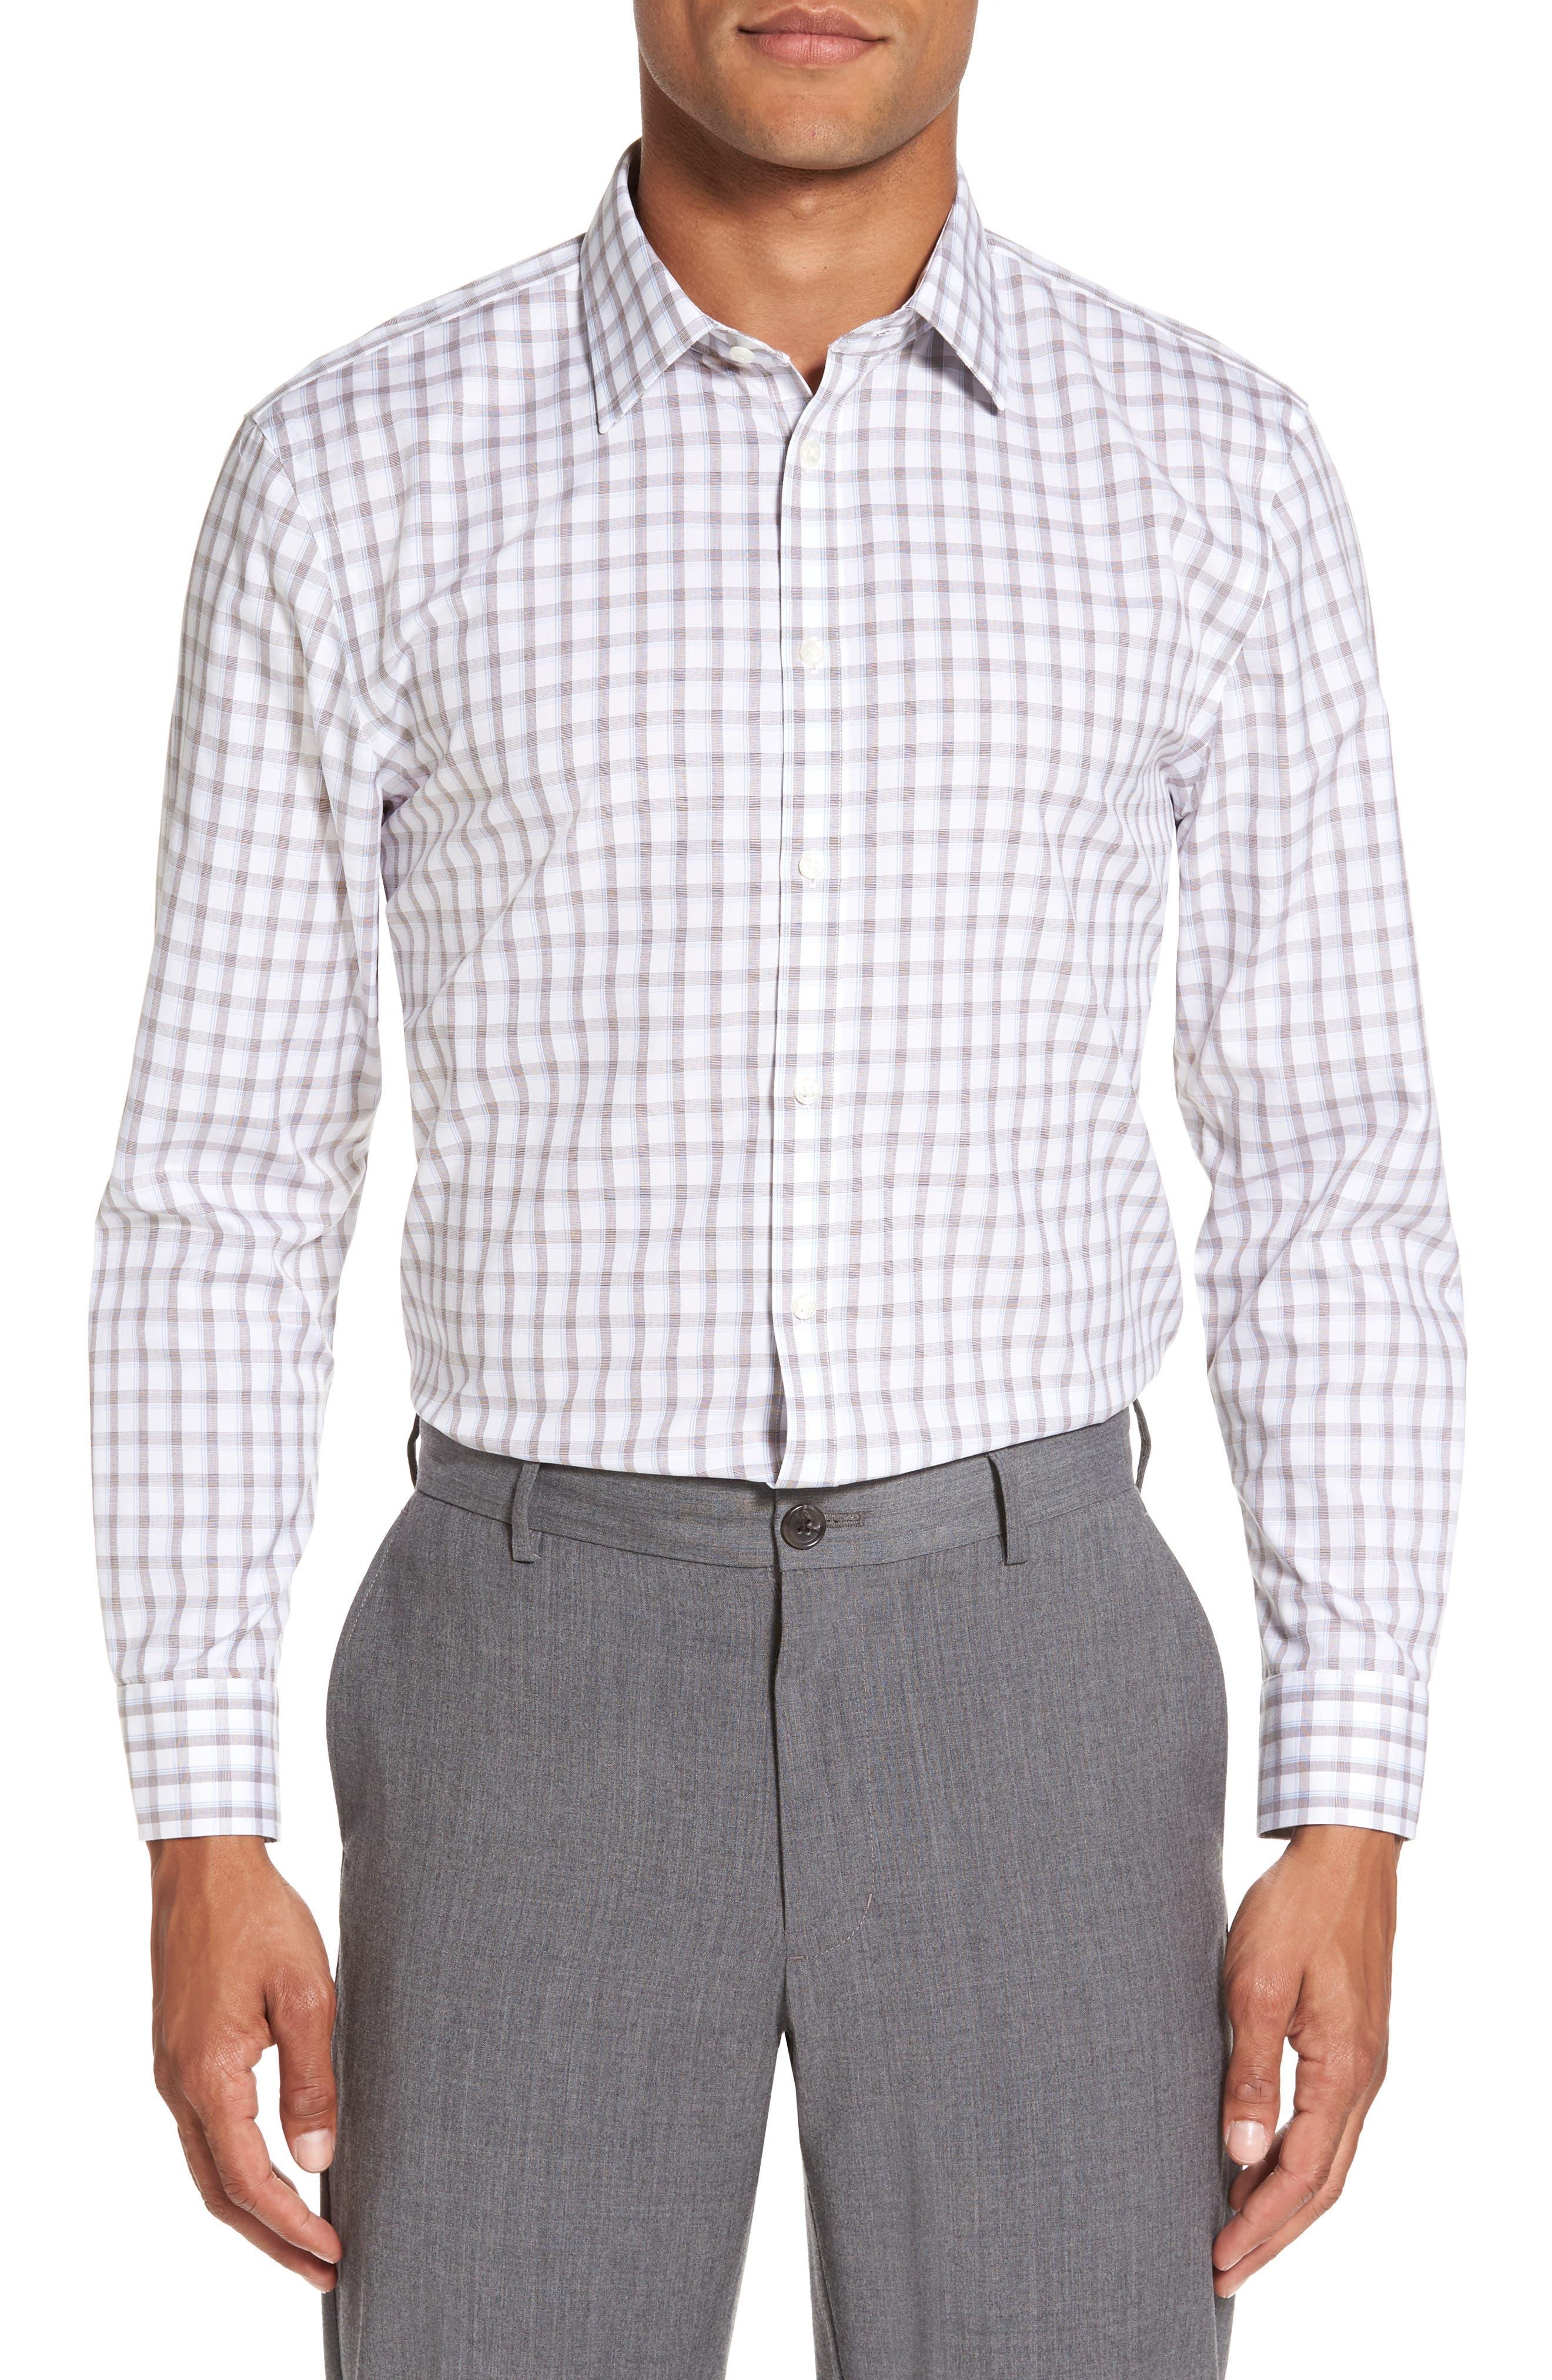 Alternate Image 2  - Nordstrom Men's Shop Smartcare™ Extra Trim Fit Plaid Dress Shirt